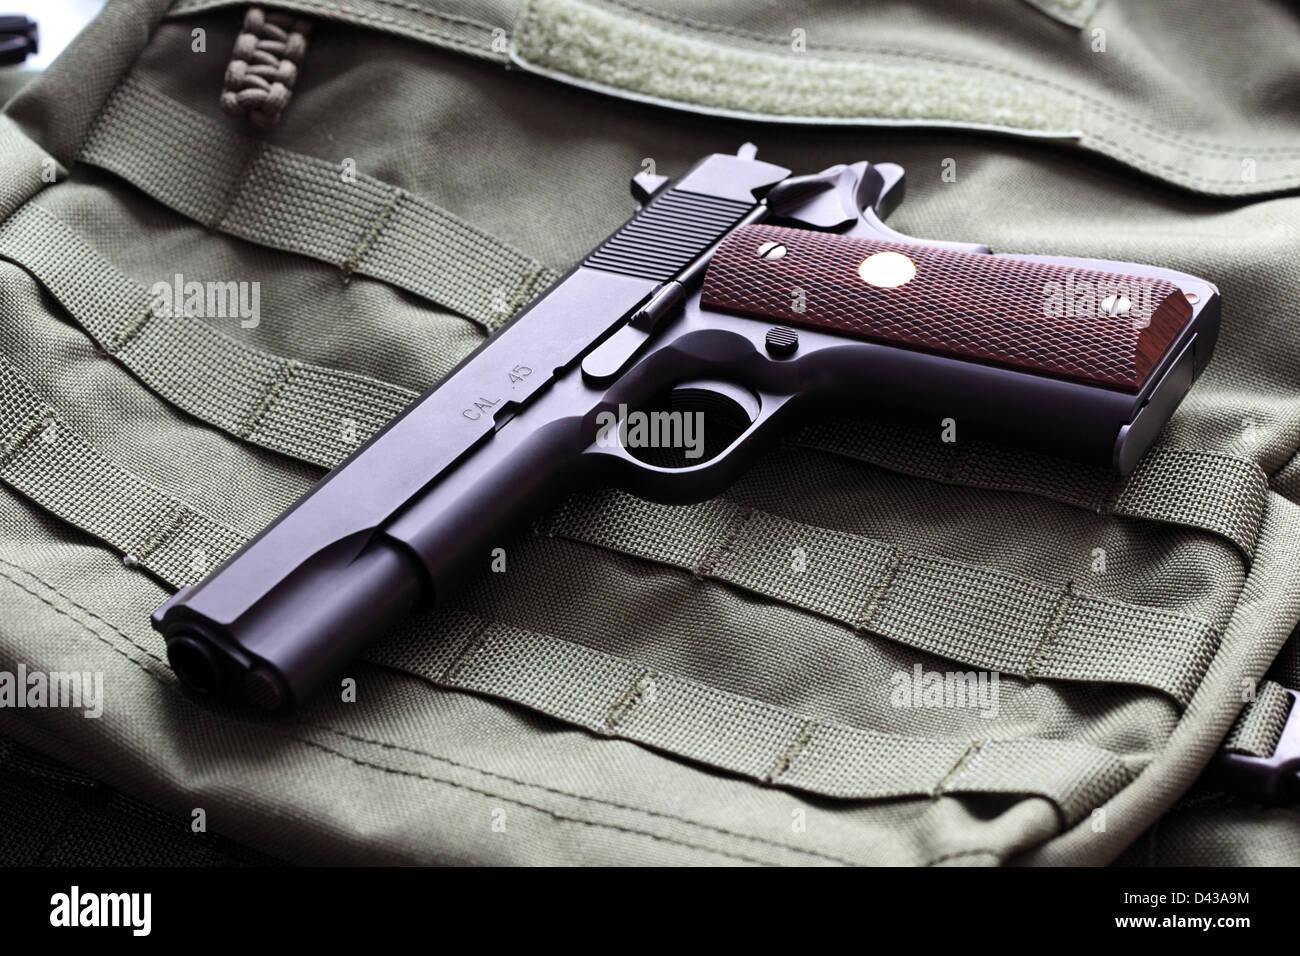 Semi-automatic Colt Mark IV Series 80 .45 caliber pistol - Stock Image